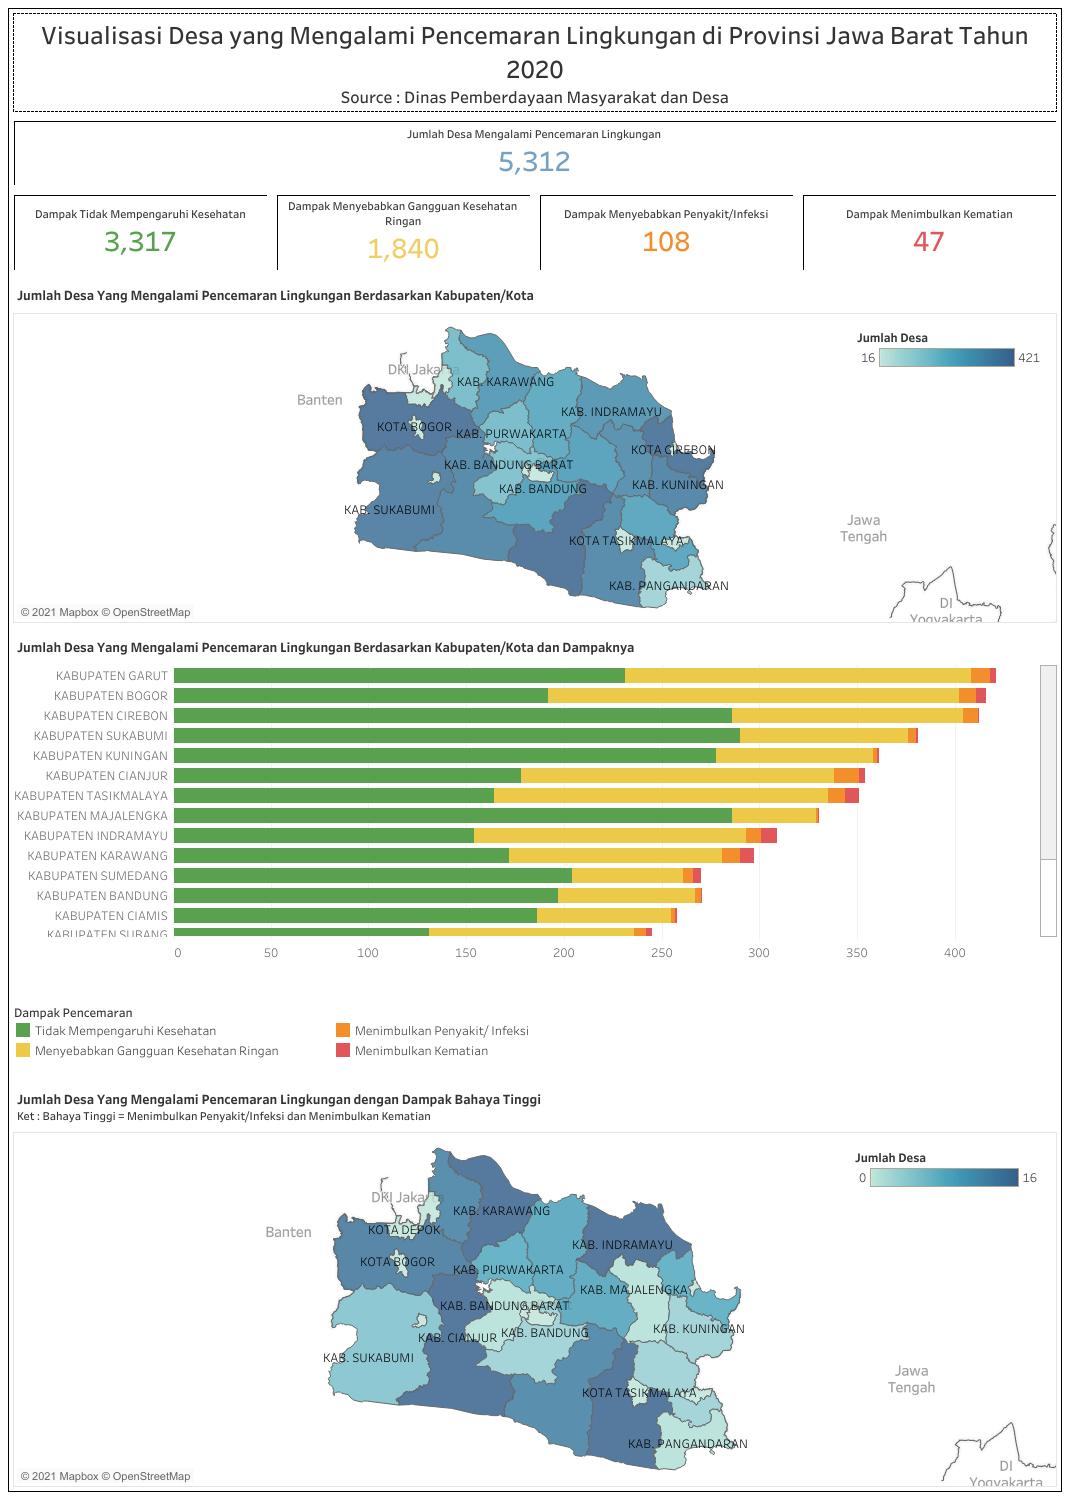 Visualisasi Desa Yang Mengalami Pencemaran Lingkungan Di Provinsi Jawa Barat Tahun 2020